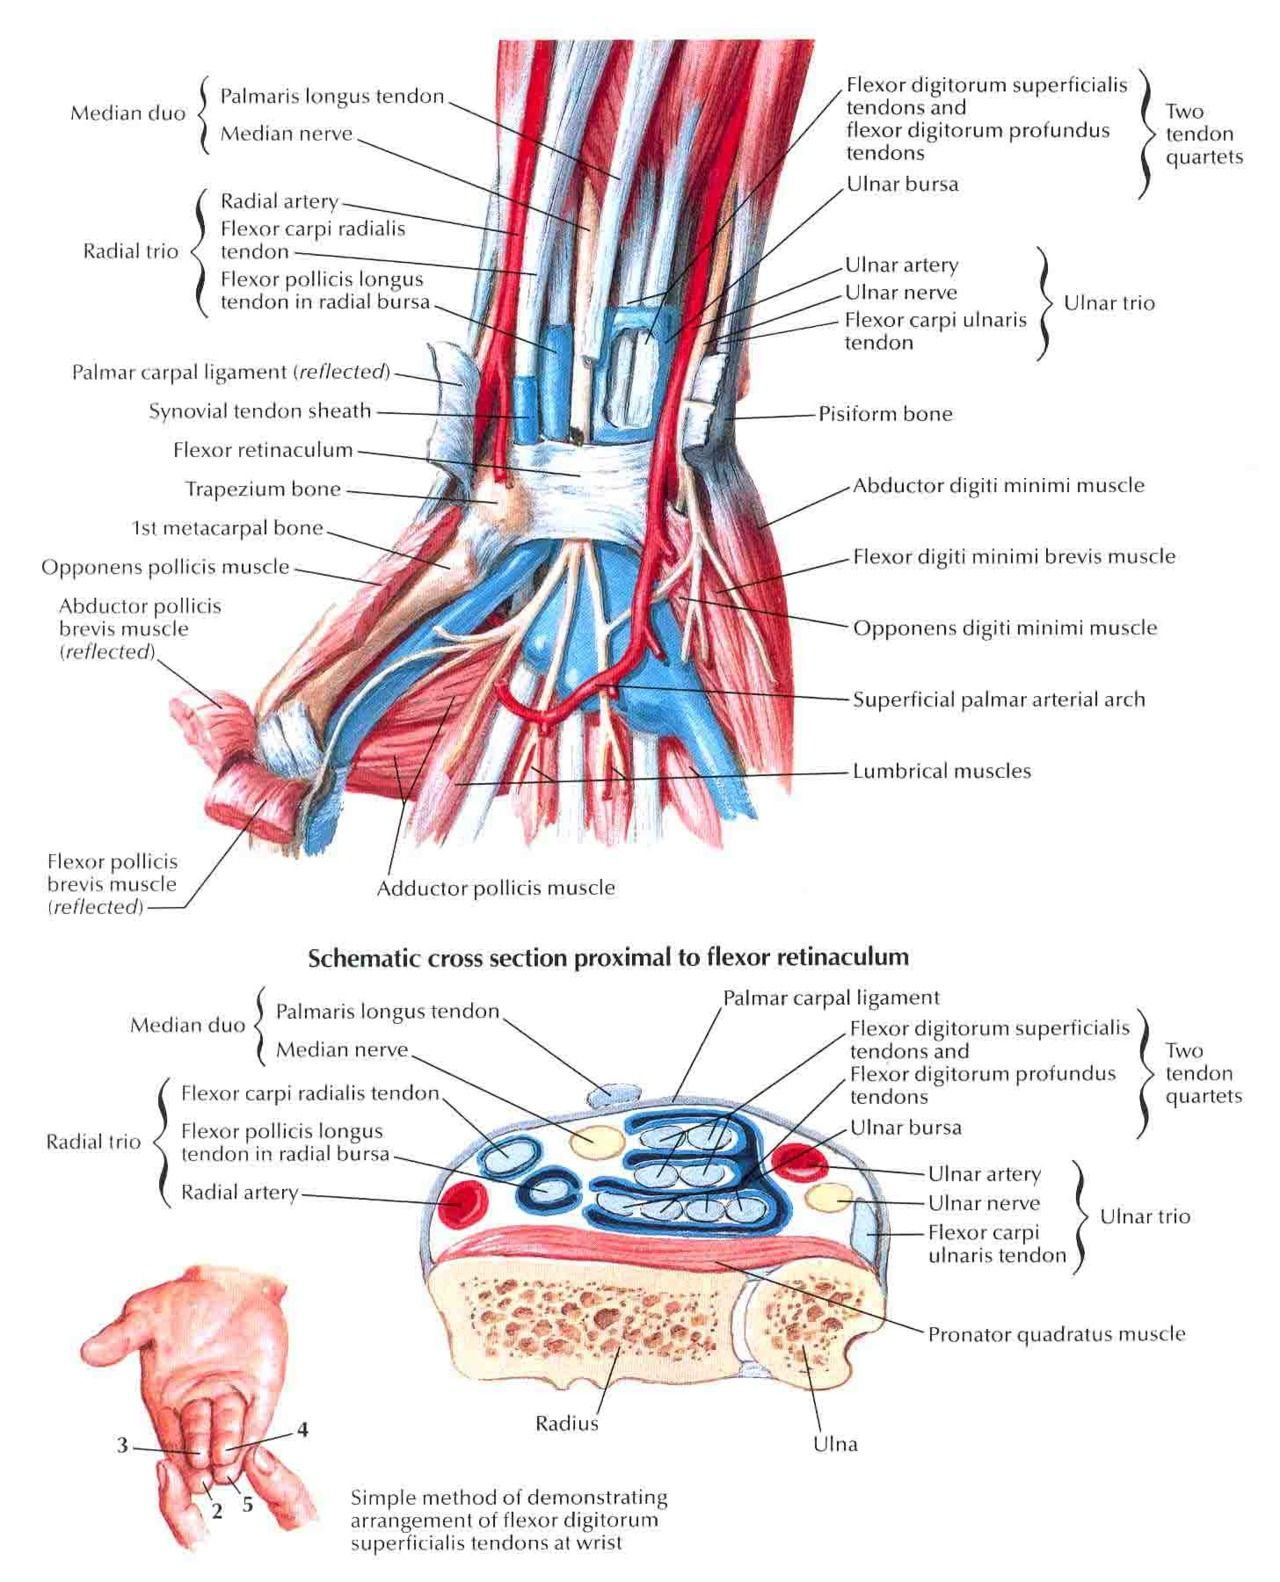 Massage Technique Diagram Labeling Animal Cell For 7th Grade Anatomy Of The Wrist Future Nurse